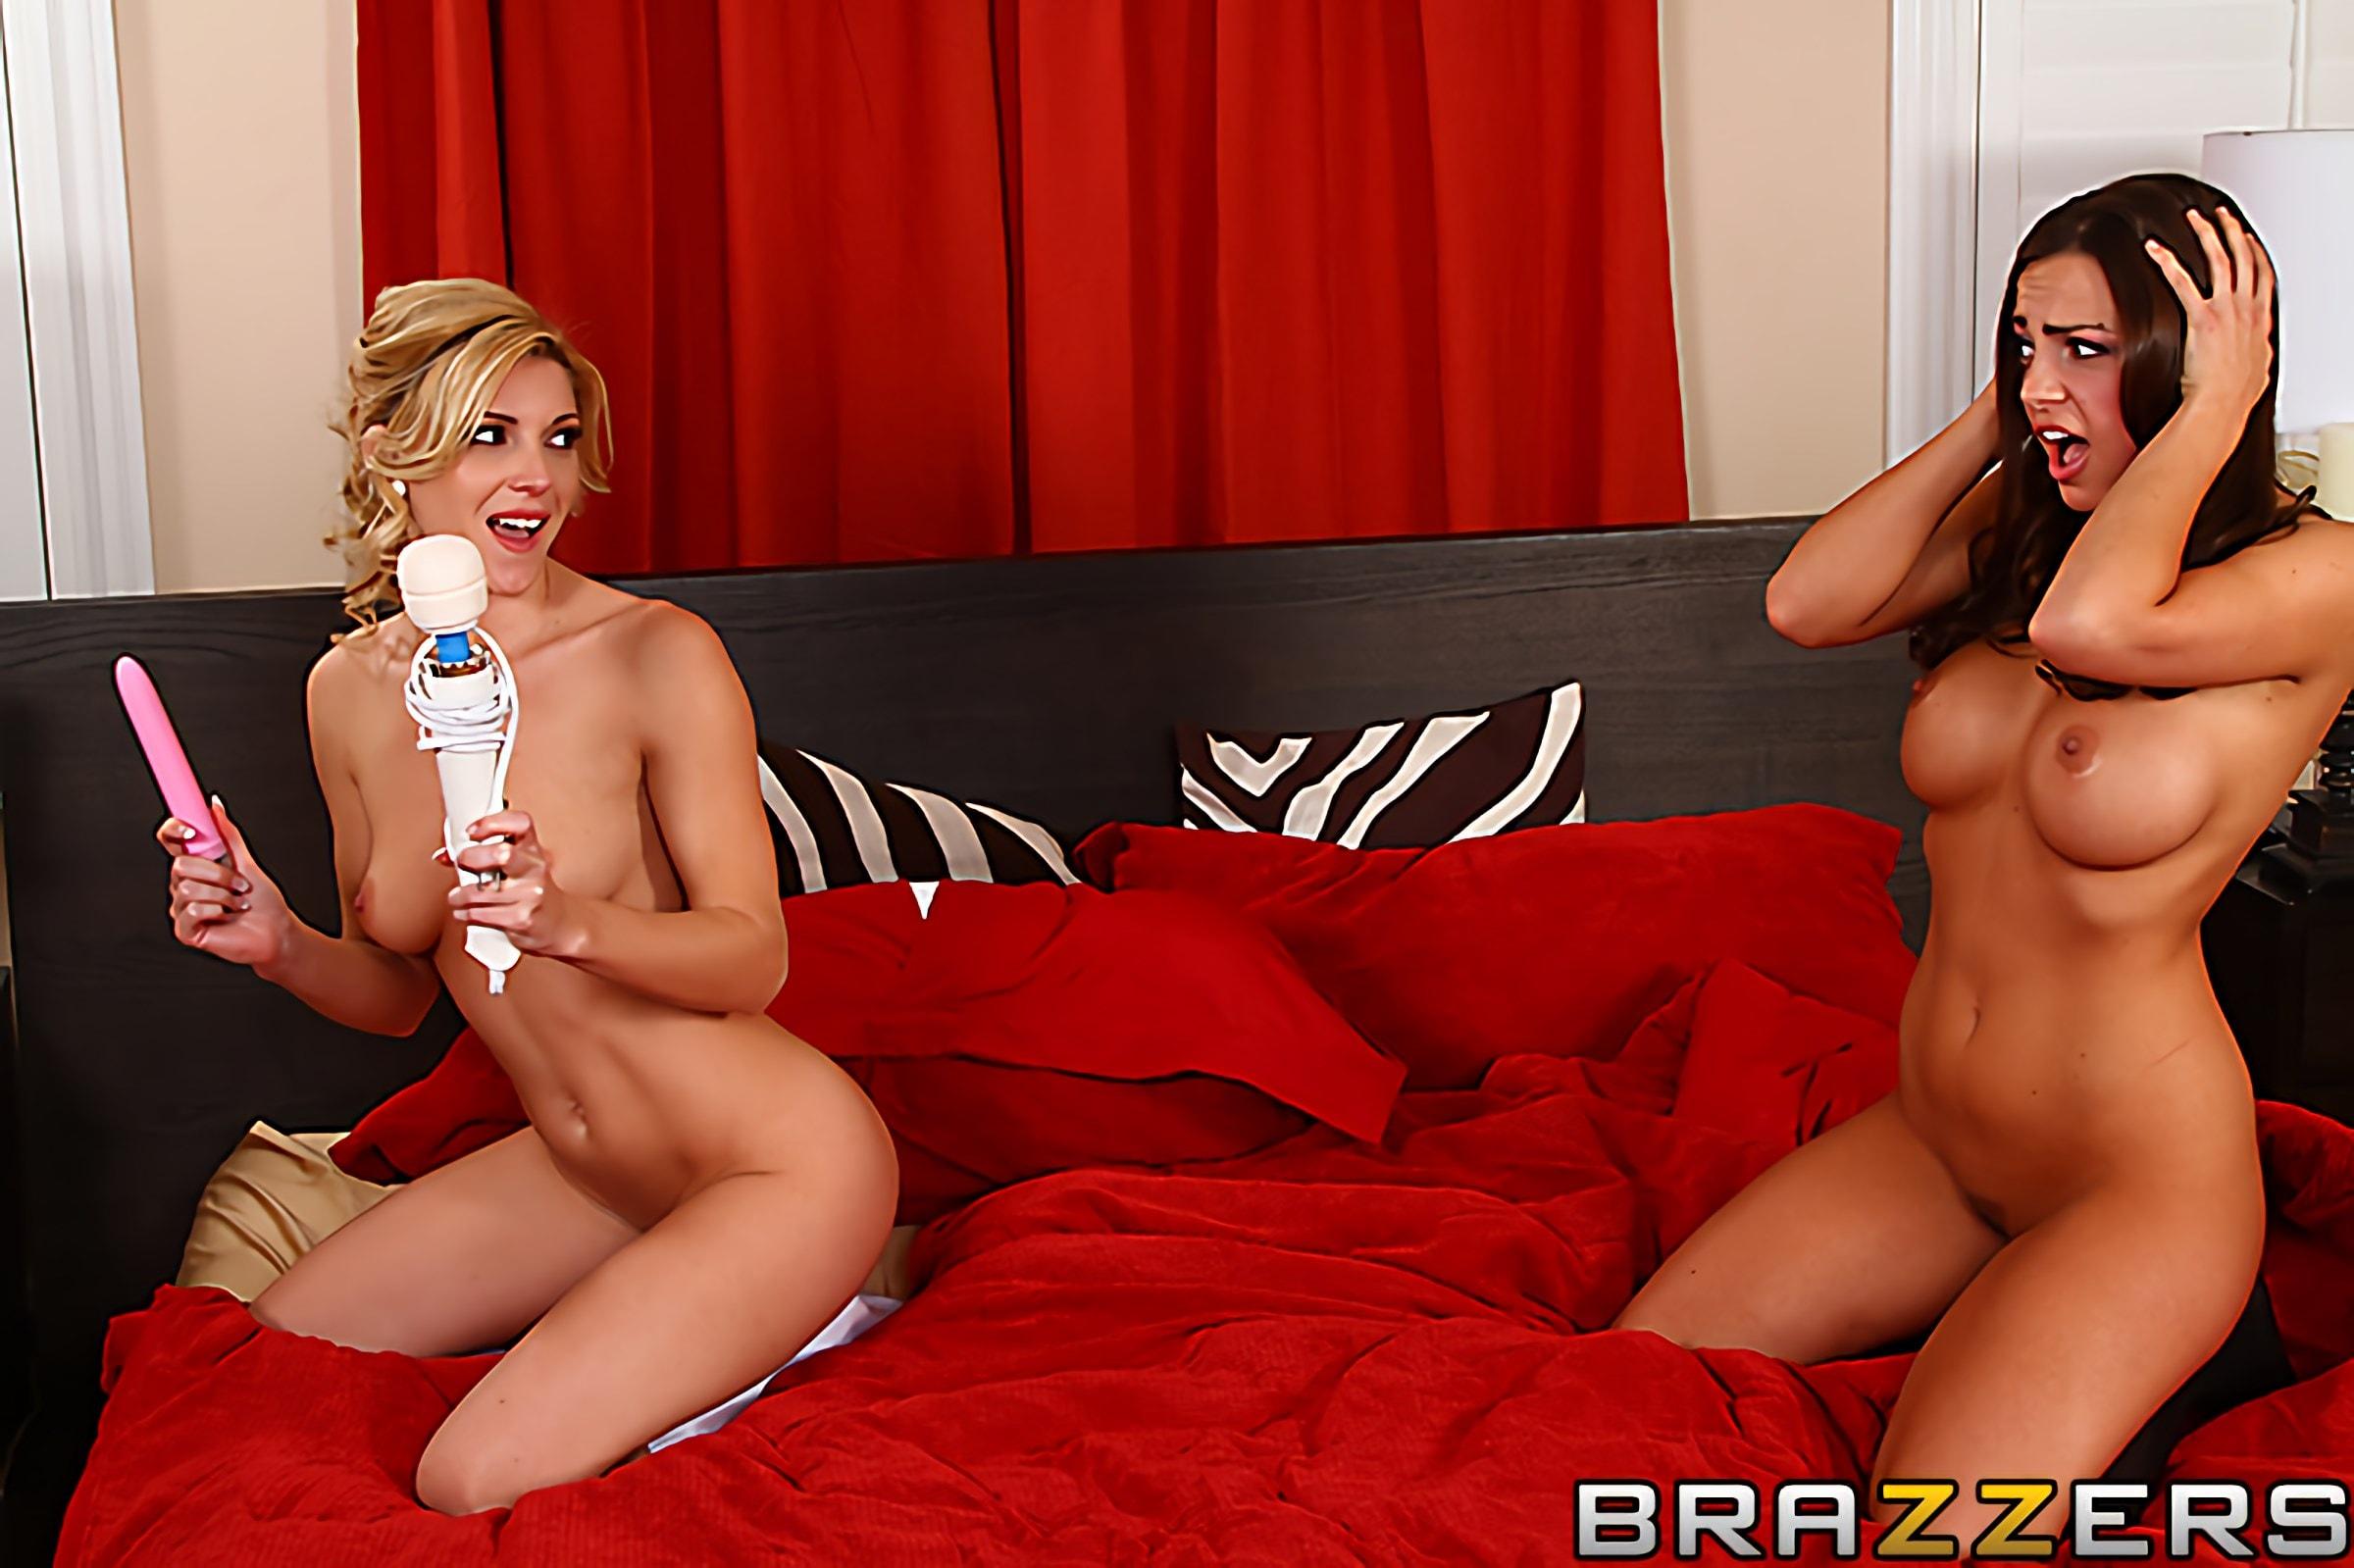 Brazzers 'We Dont Need Boys' starring Abigail Mac (Photo 5)